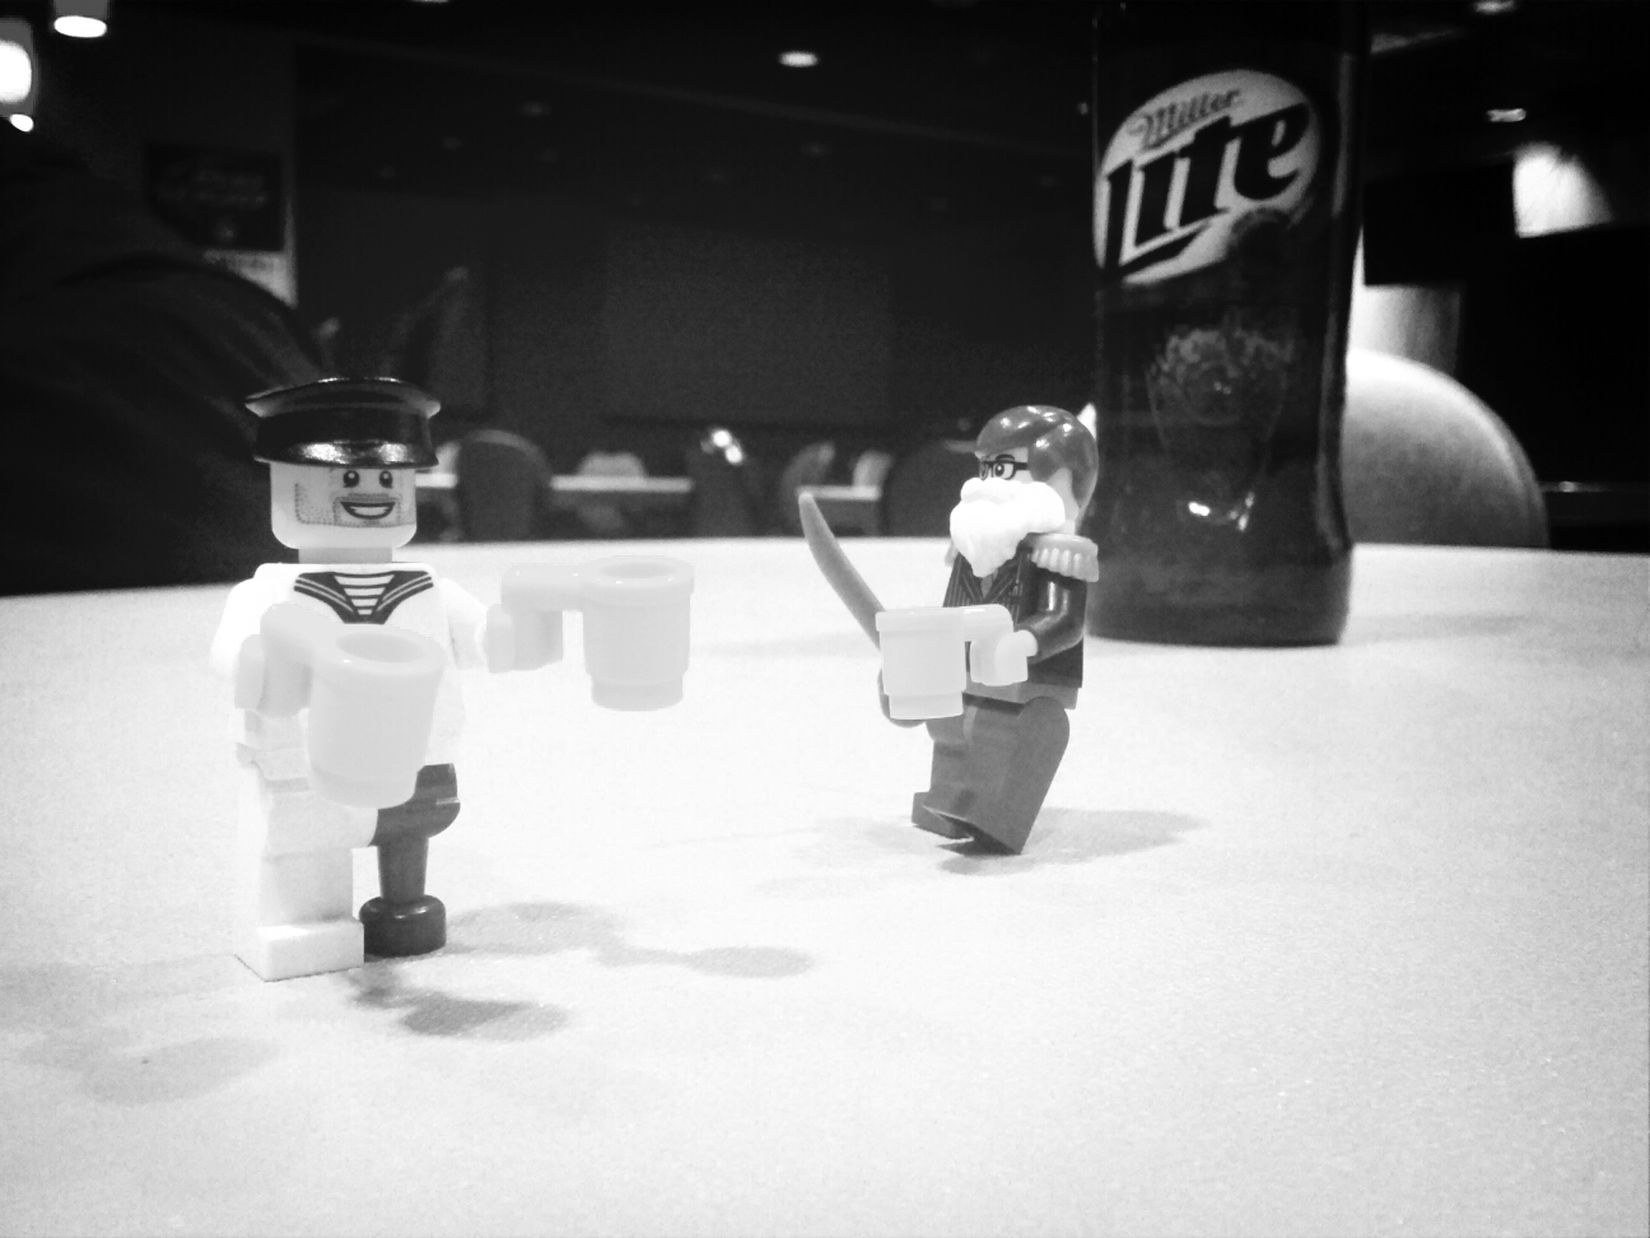 Pegleg Legos